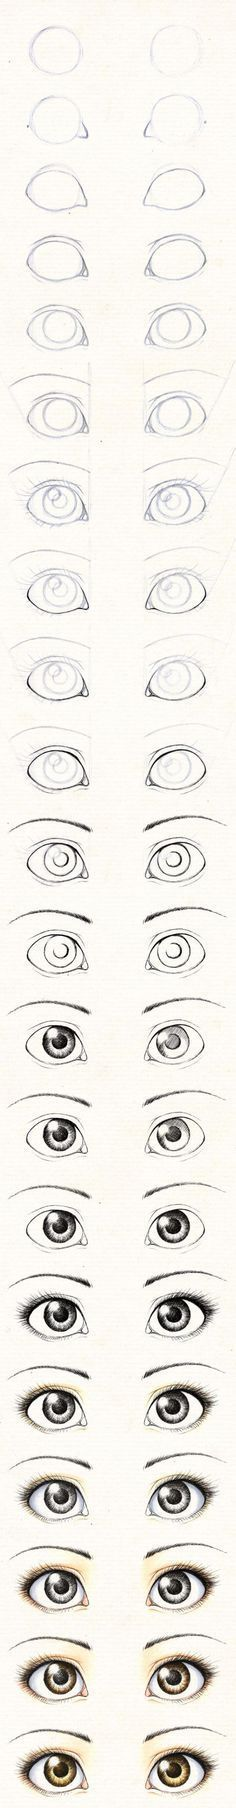 How to draw doll eyes / Рисуем глаза текстильной кукле. - Ярмарка Мастеров - ручная работа, handmade